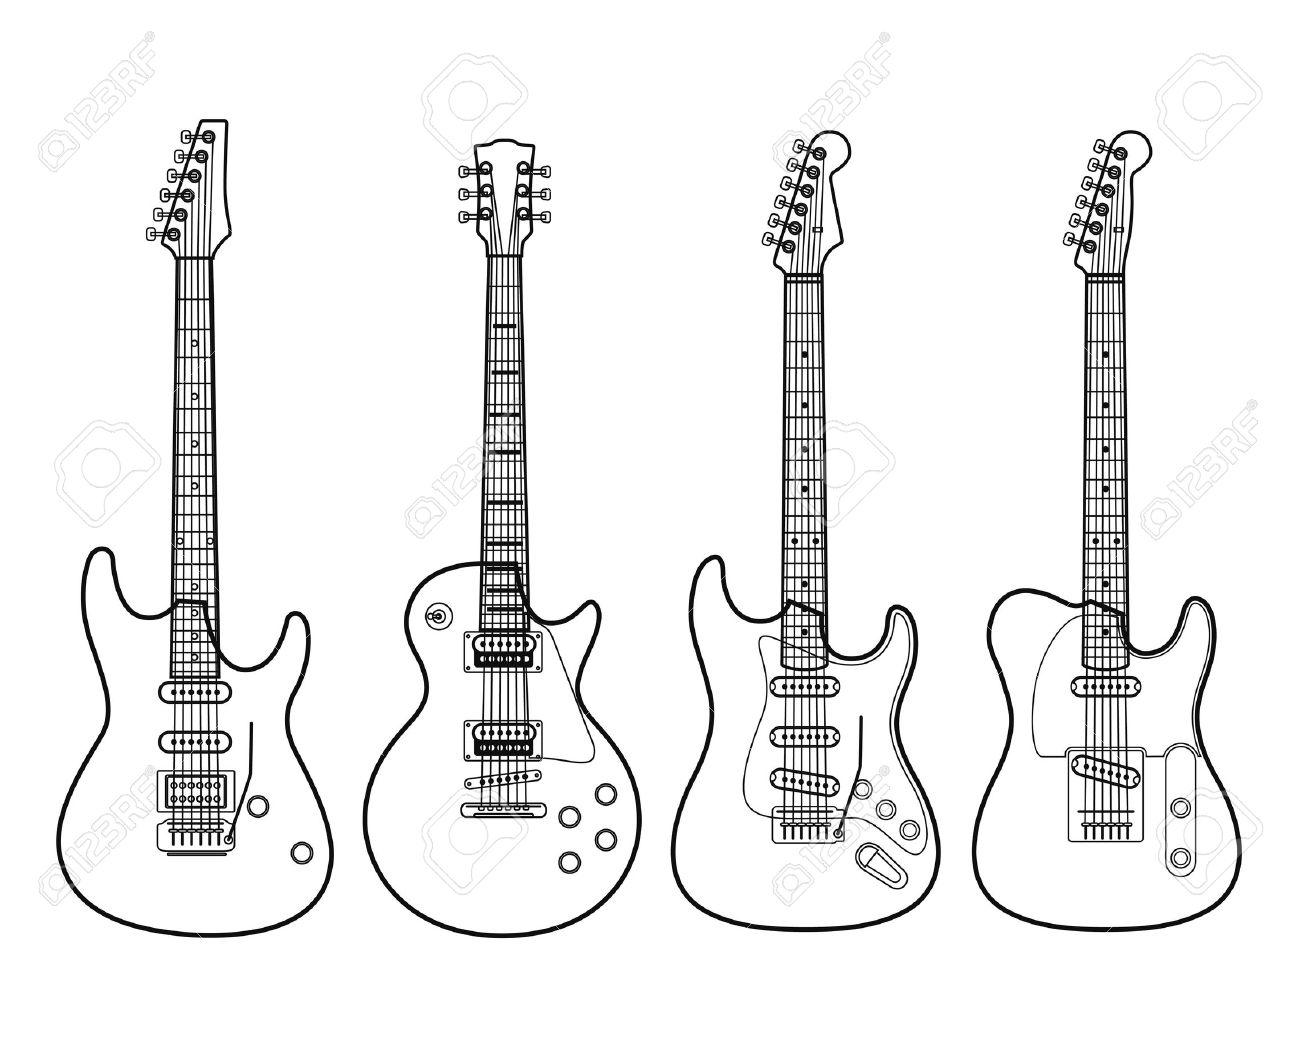 fender guitar outline - photo #20